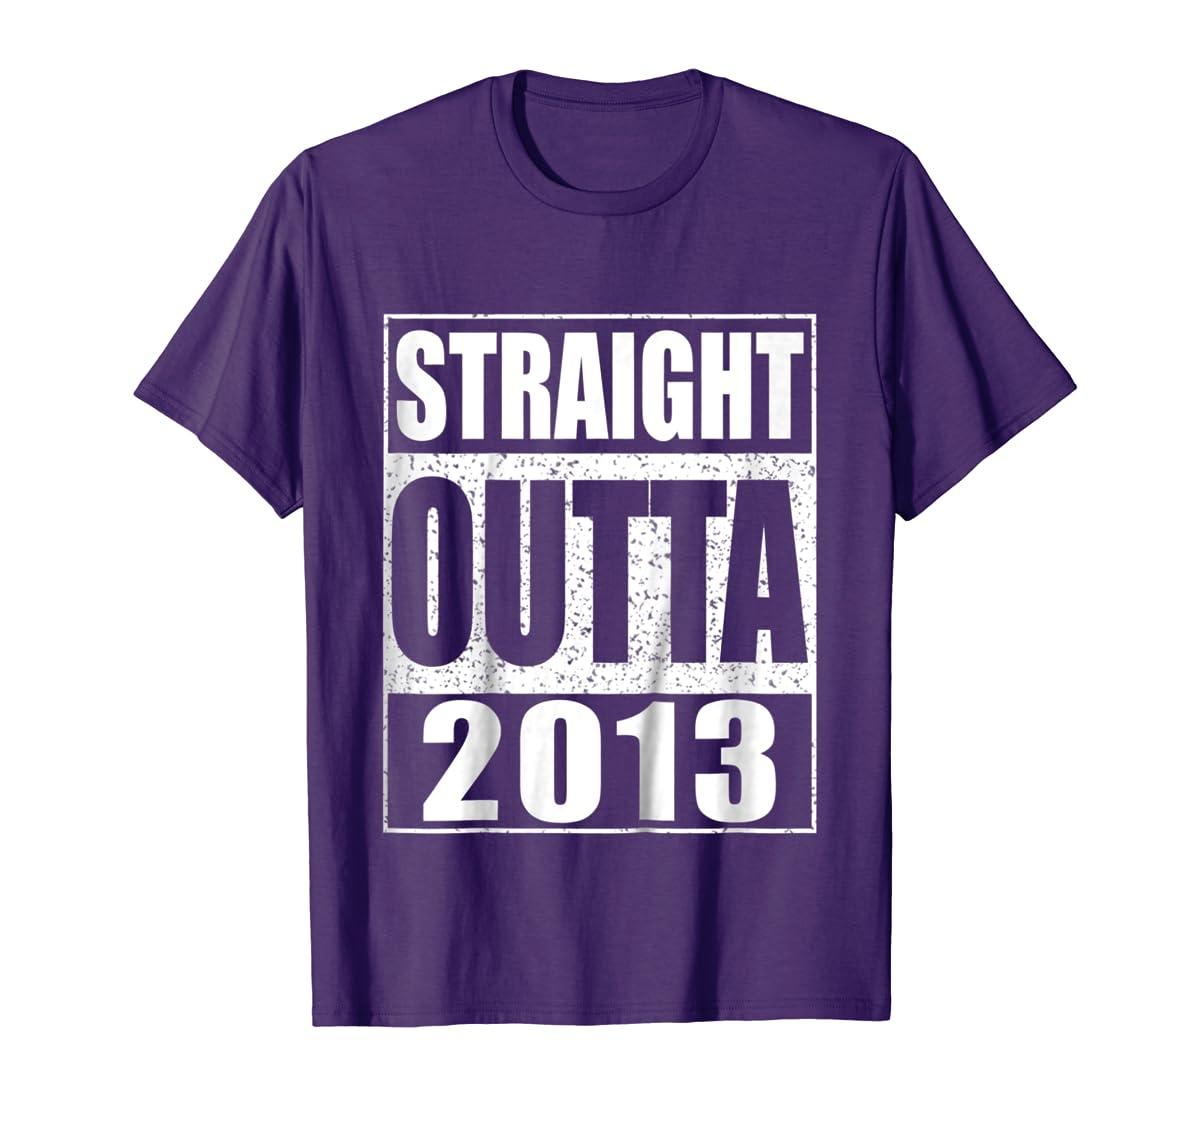 Kids Straight Outta 2013 T-Shirt 6th Birthday Gift Shirt-Men's T-Shirt-Purple